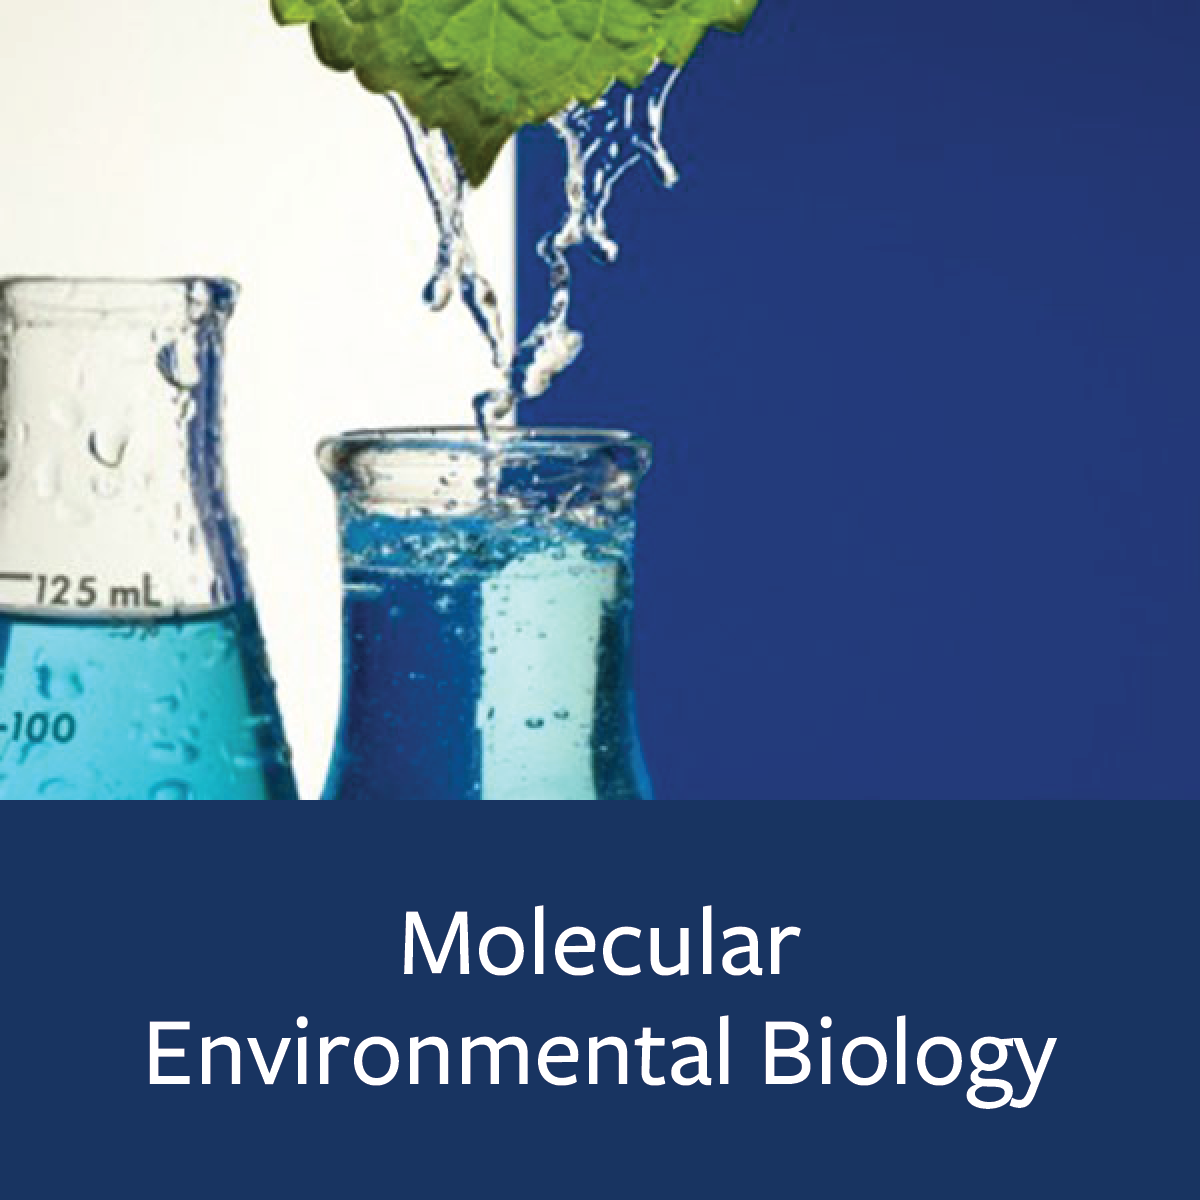 Molecular Environmental Biology Major Map